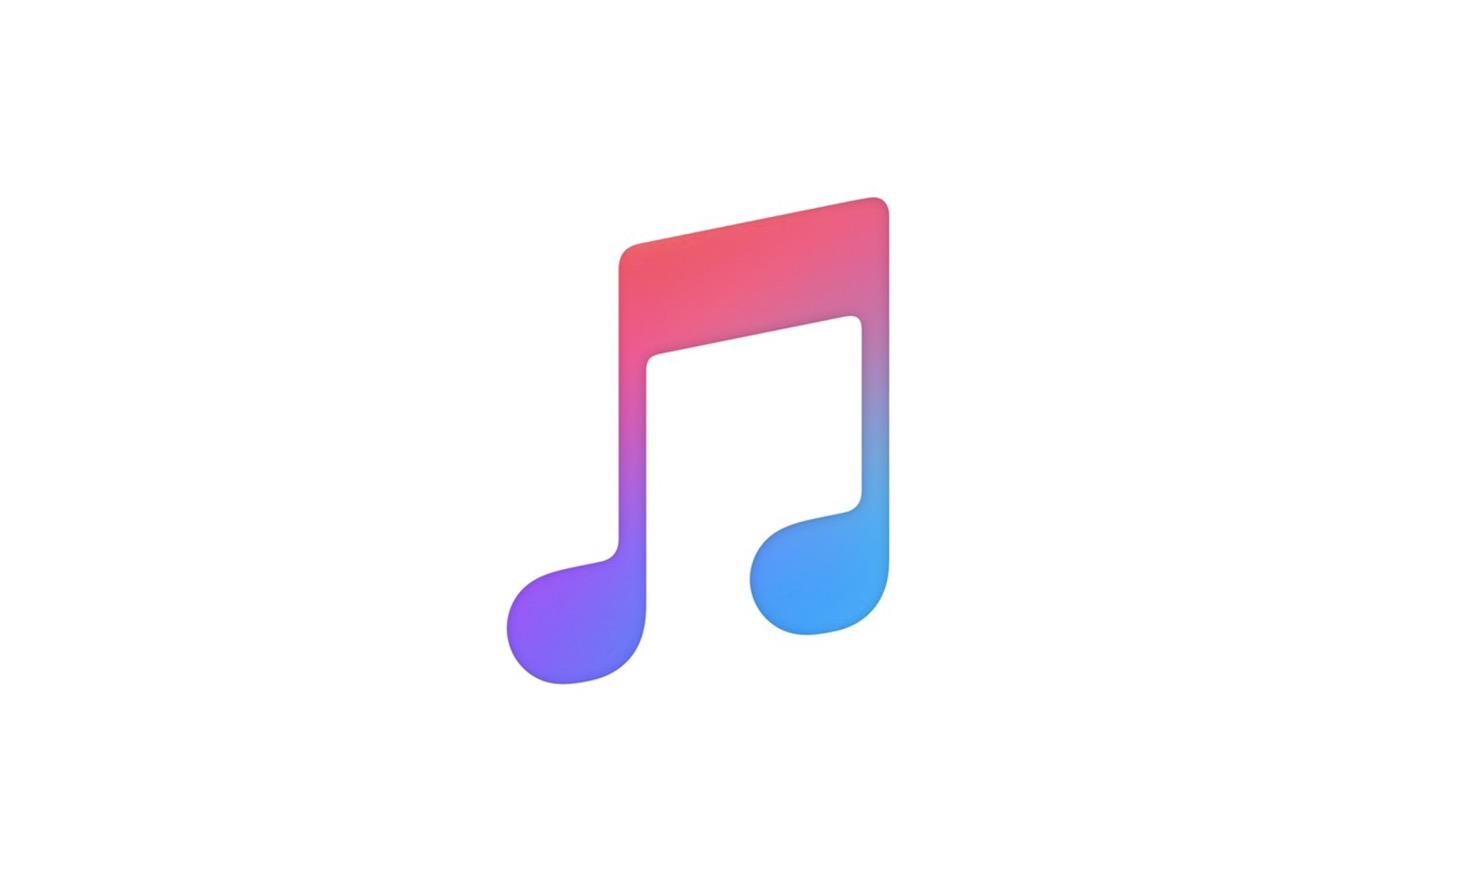 Apple Music 为独立厂牌和发行商提供 5,000 万美元的基金支持